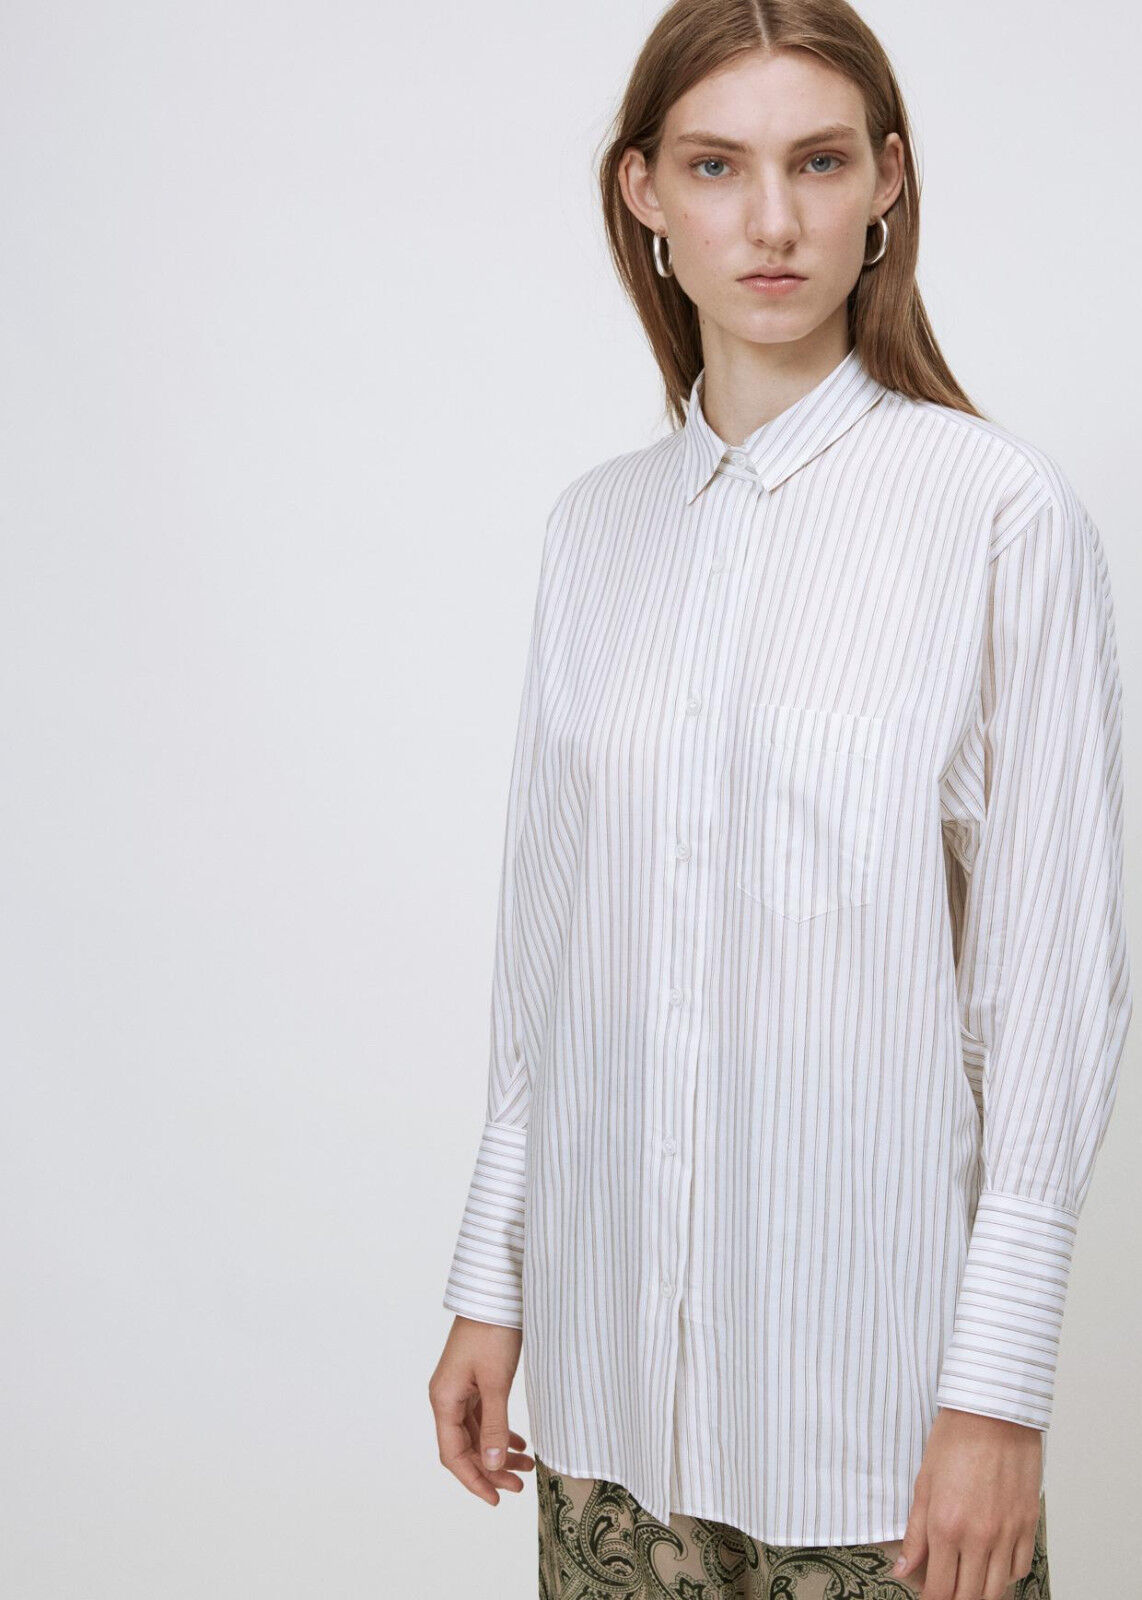 NEW Acne Studios 40 Bai C Stripe Beige Collarot Cotton Shirt Blouse Button